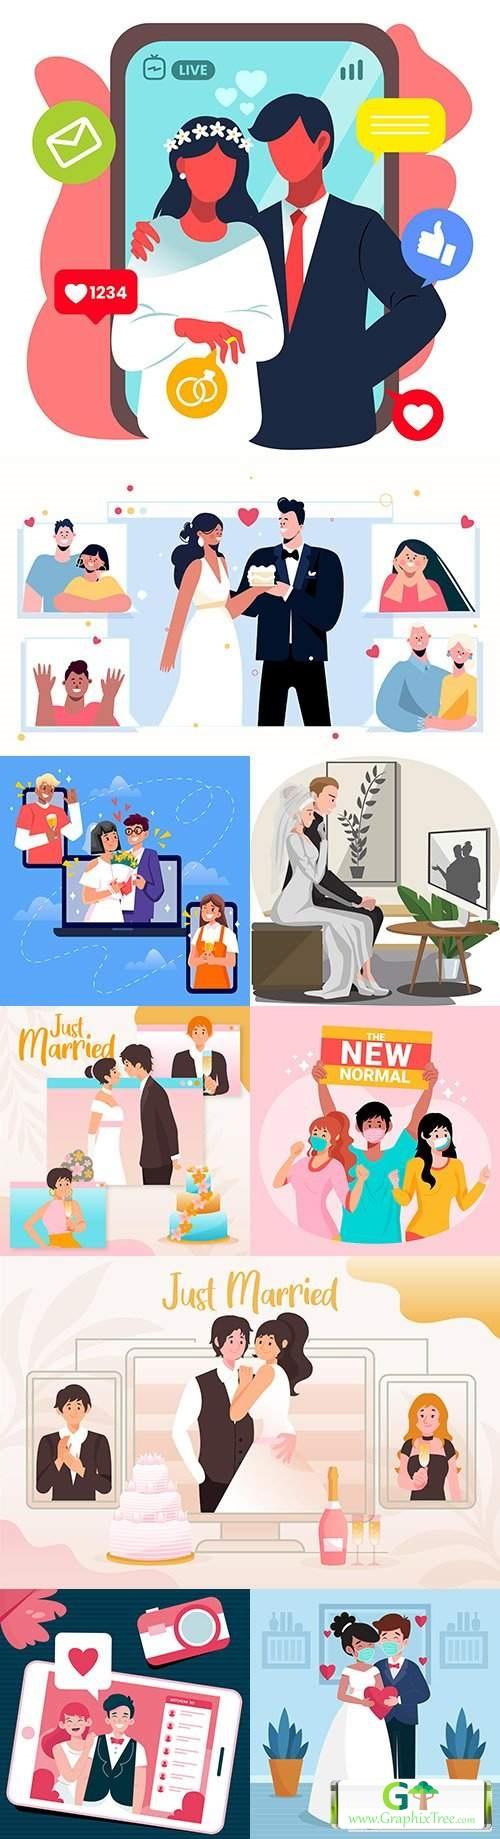 Wedding festive ceremony flat design illustration